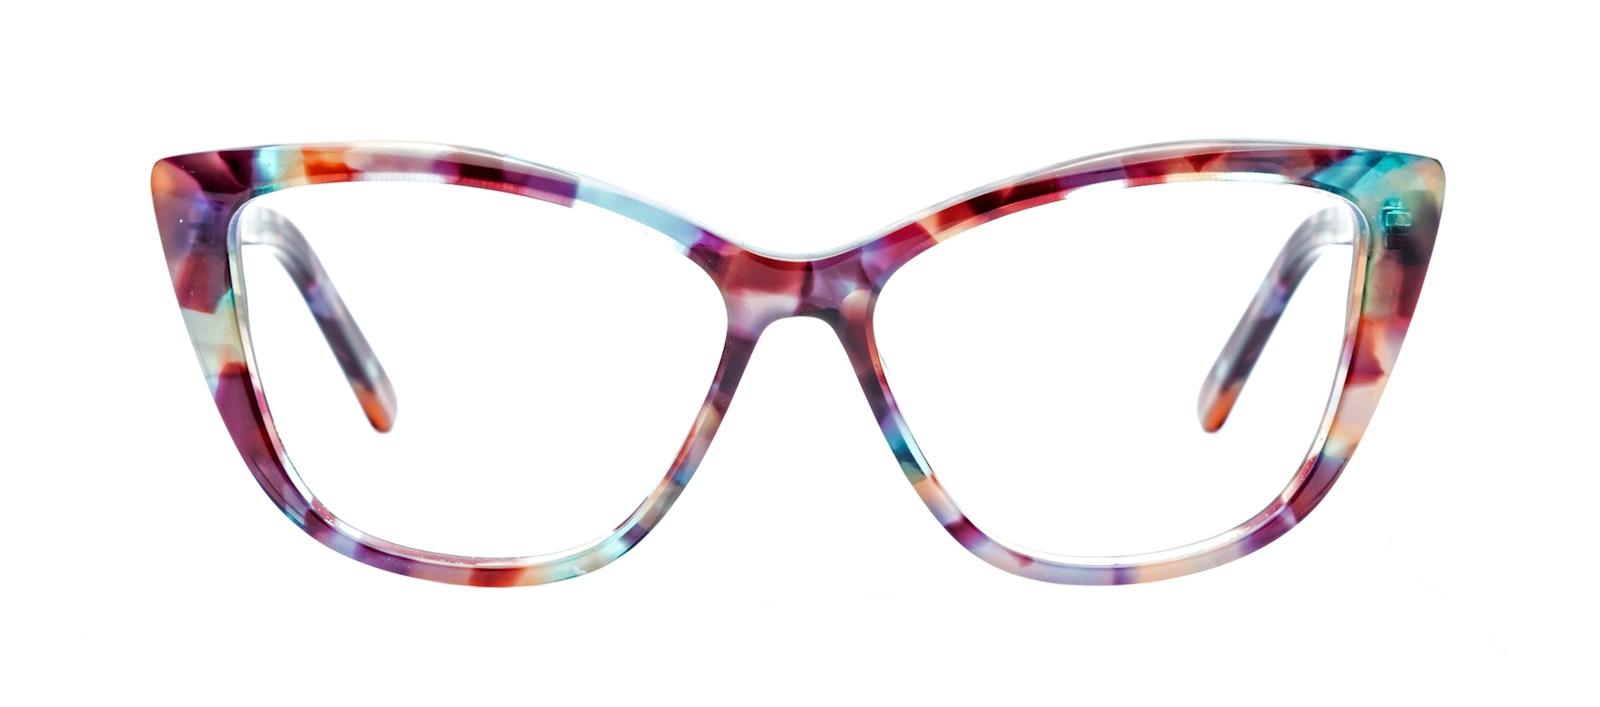 9a723b35f644 ... Affordable Fashion Glasses Cat Eye Daring Cateye Eyeglasses Women  Dolled Up Dazzling Front ...